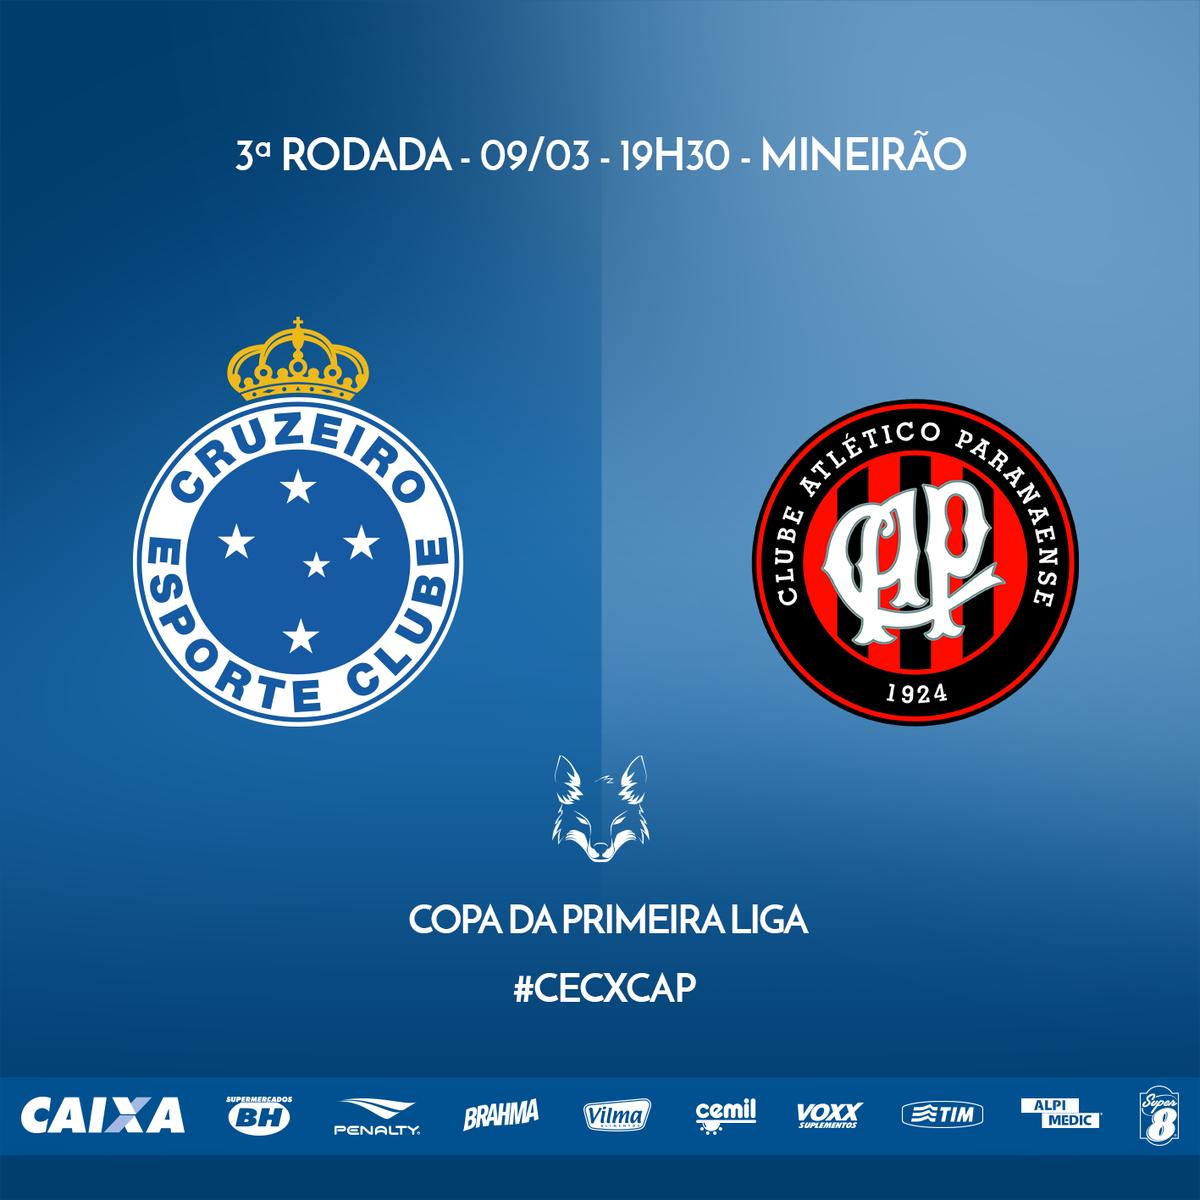 8eb7a93d7b Cruzeiro Esporte Clube on Twitter